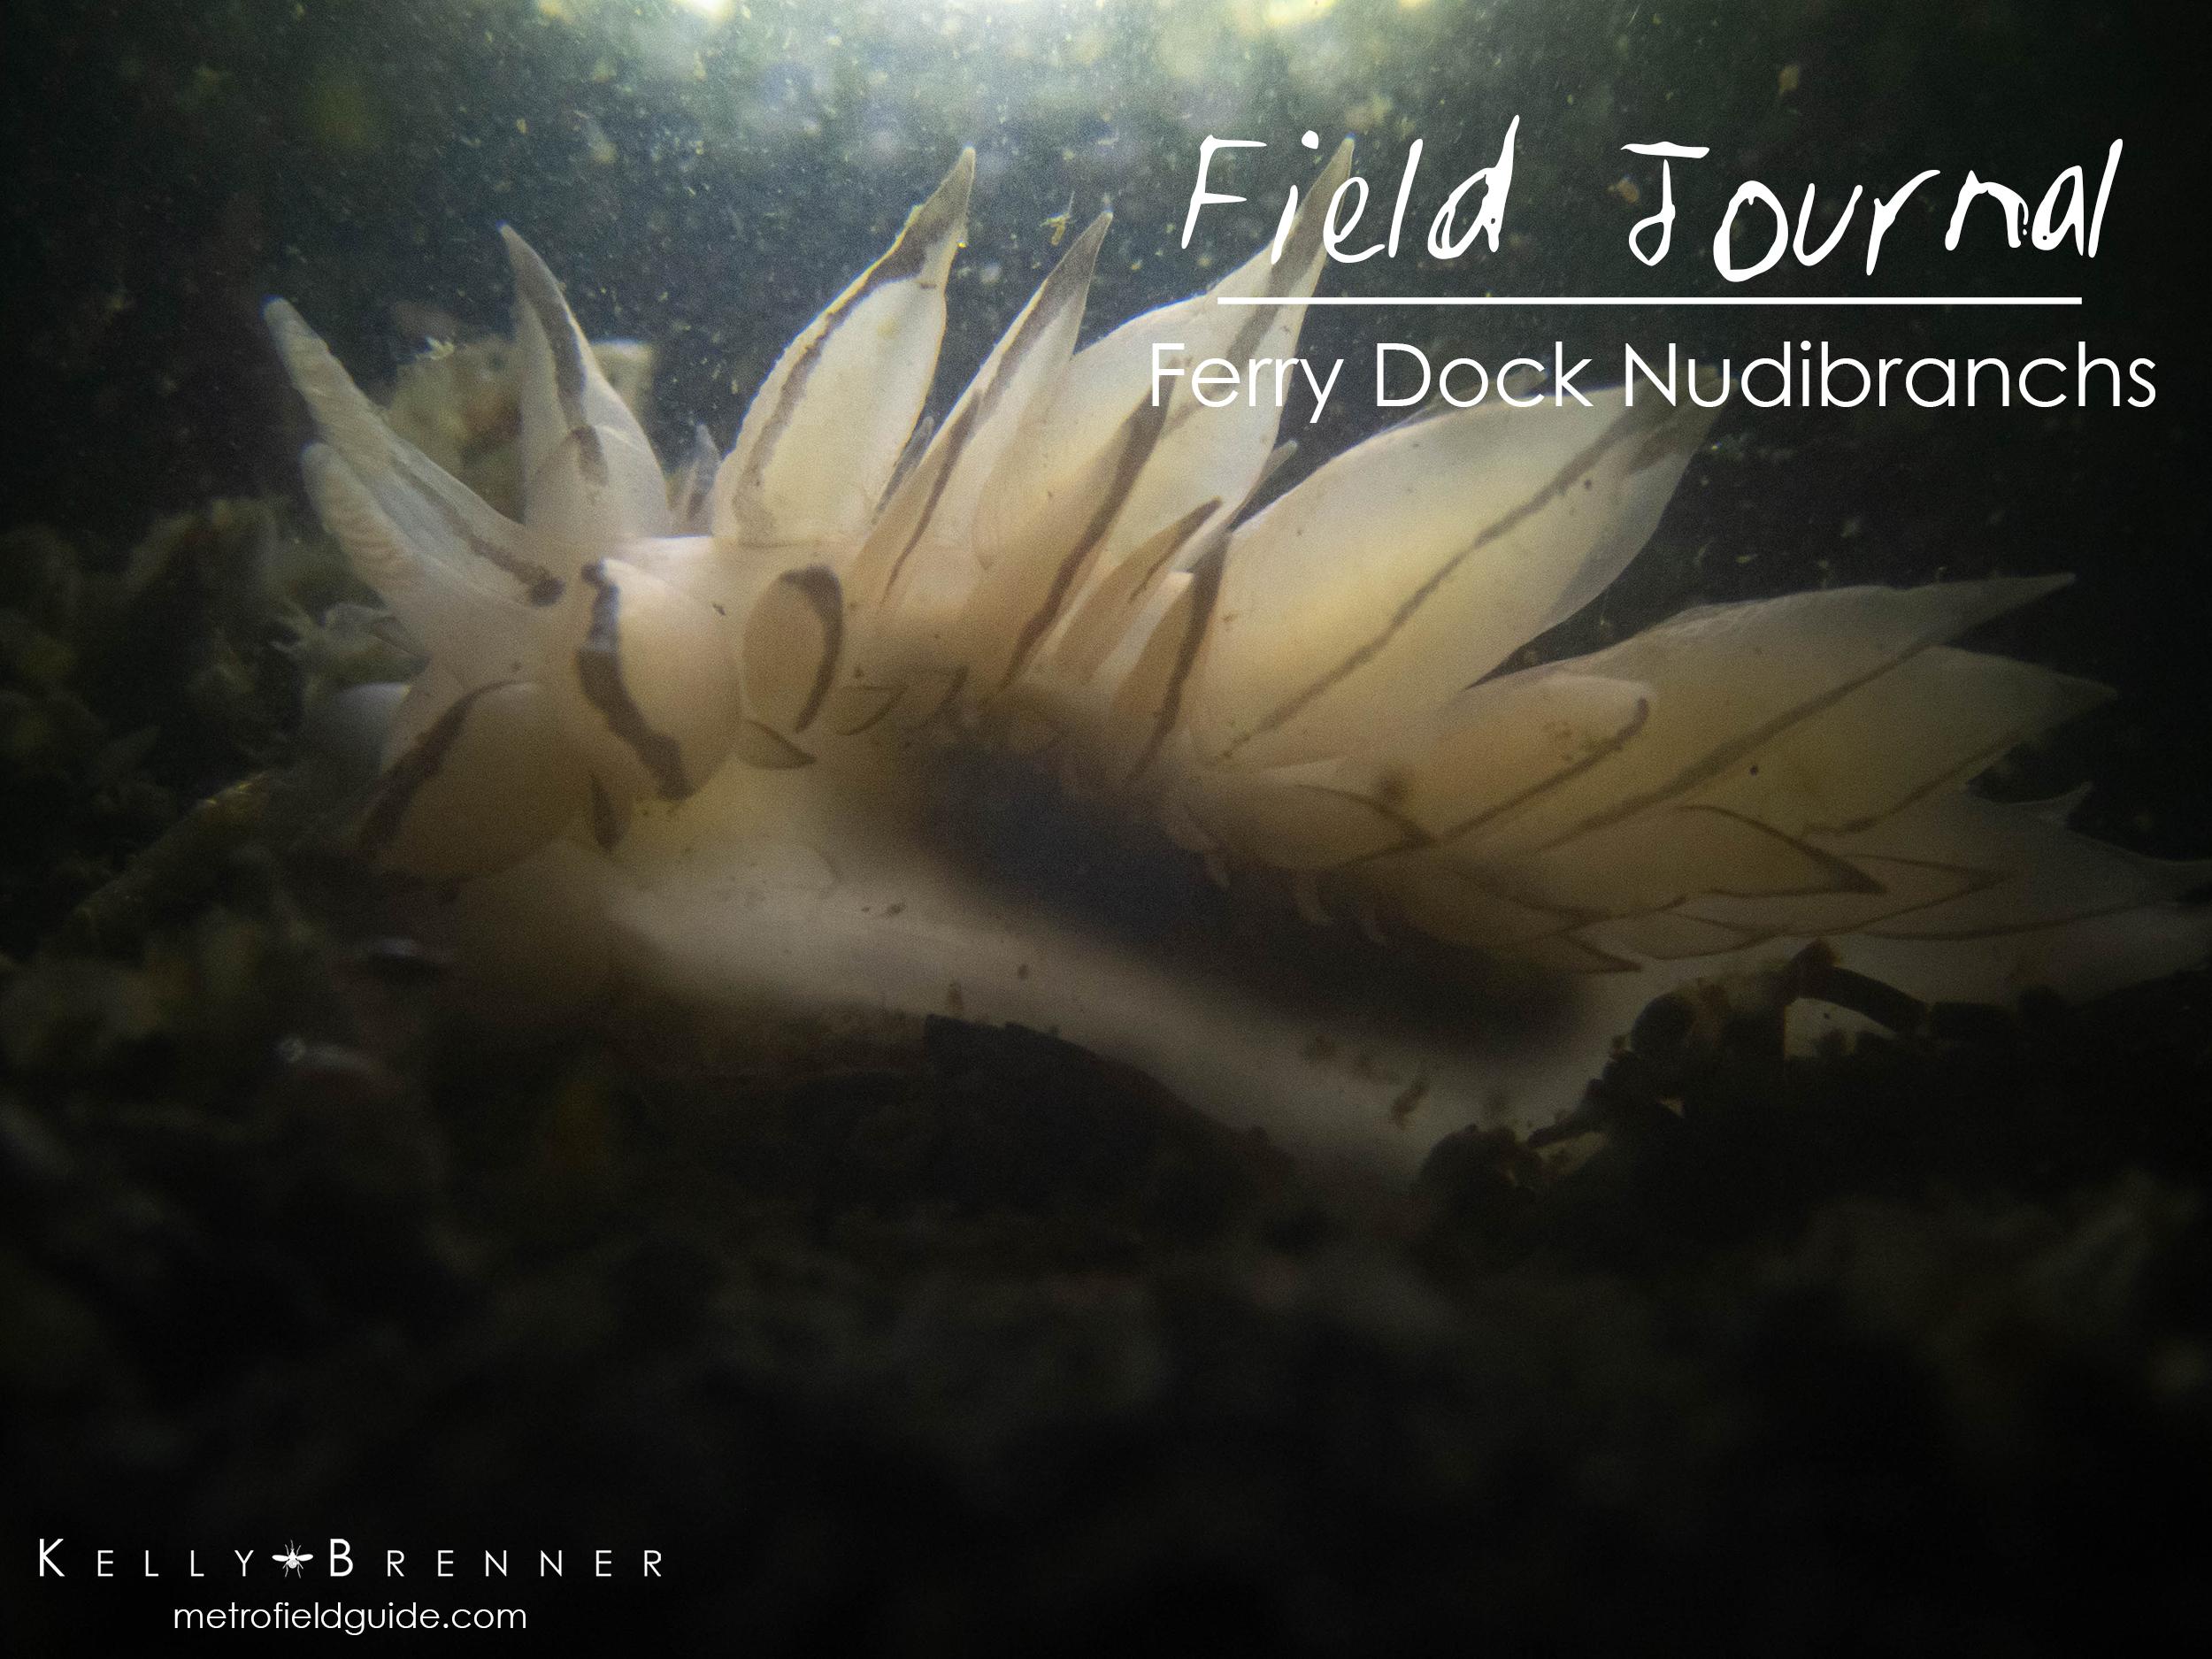 Field Journal: Ferry Dock Nudibranchs